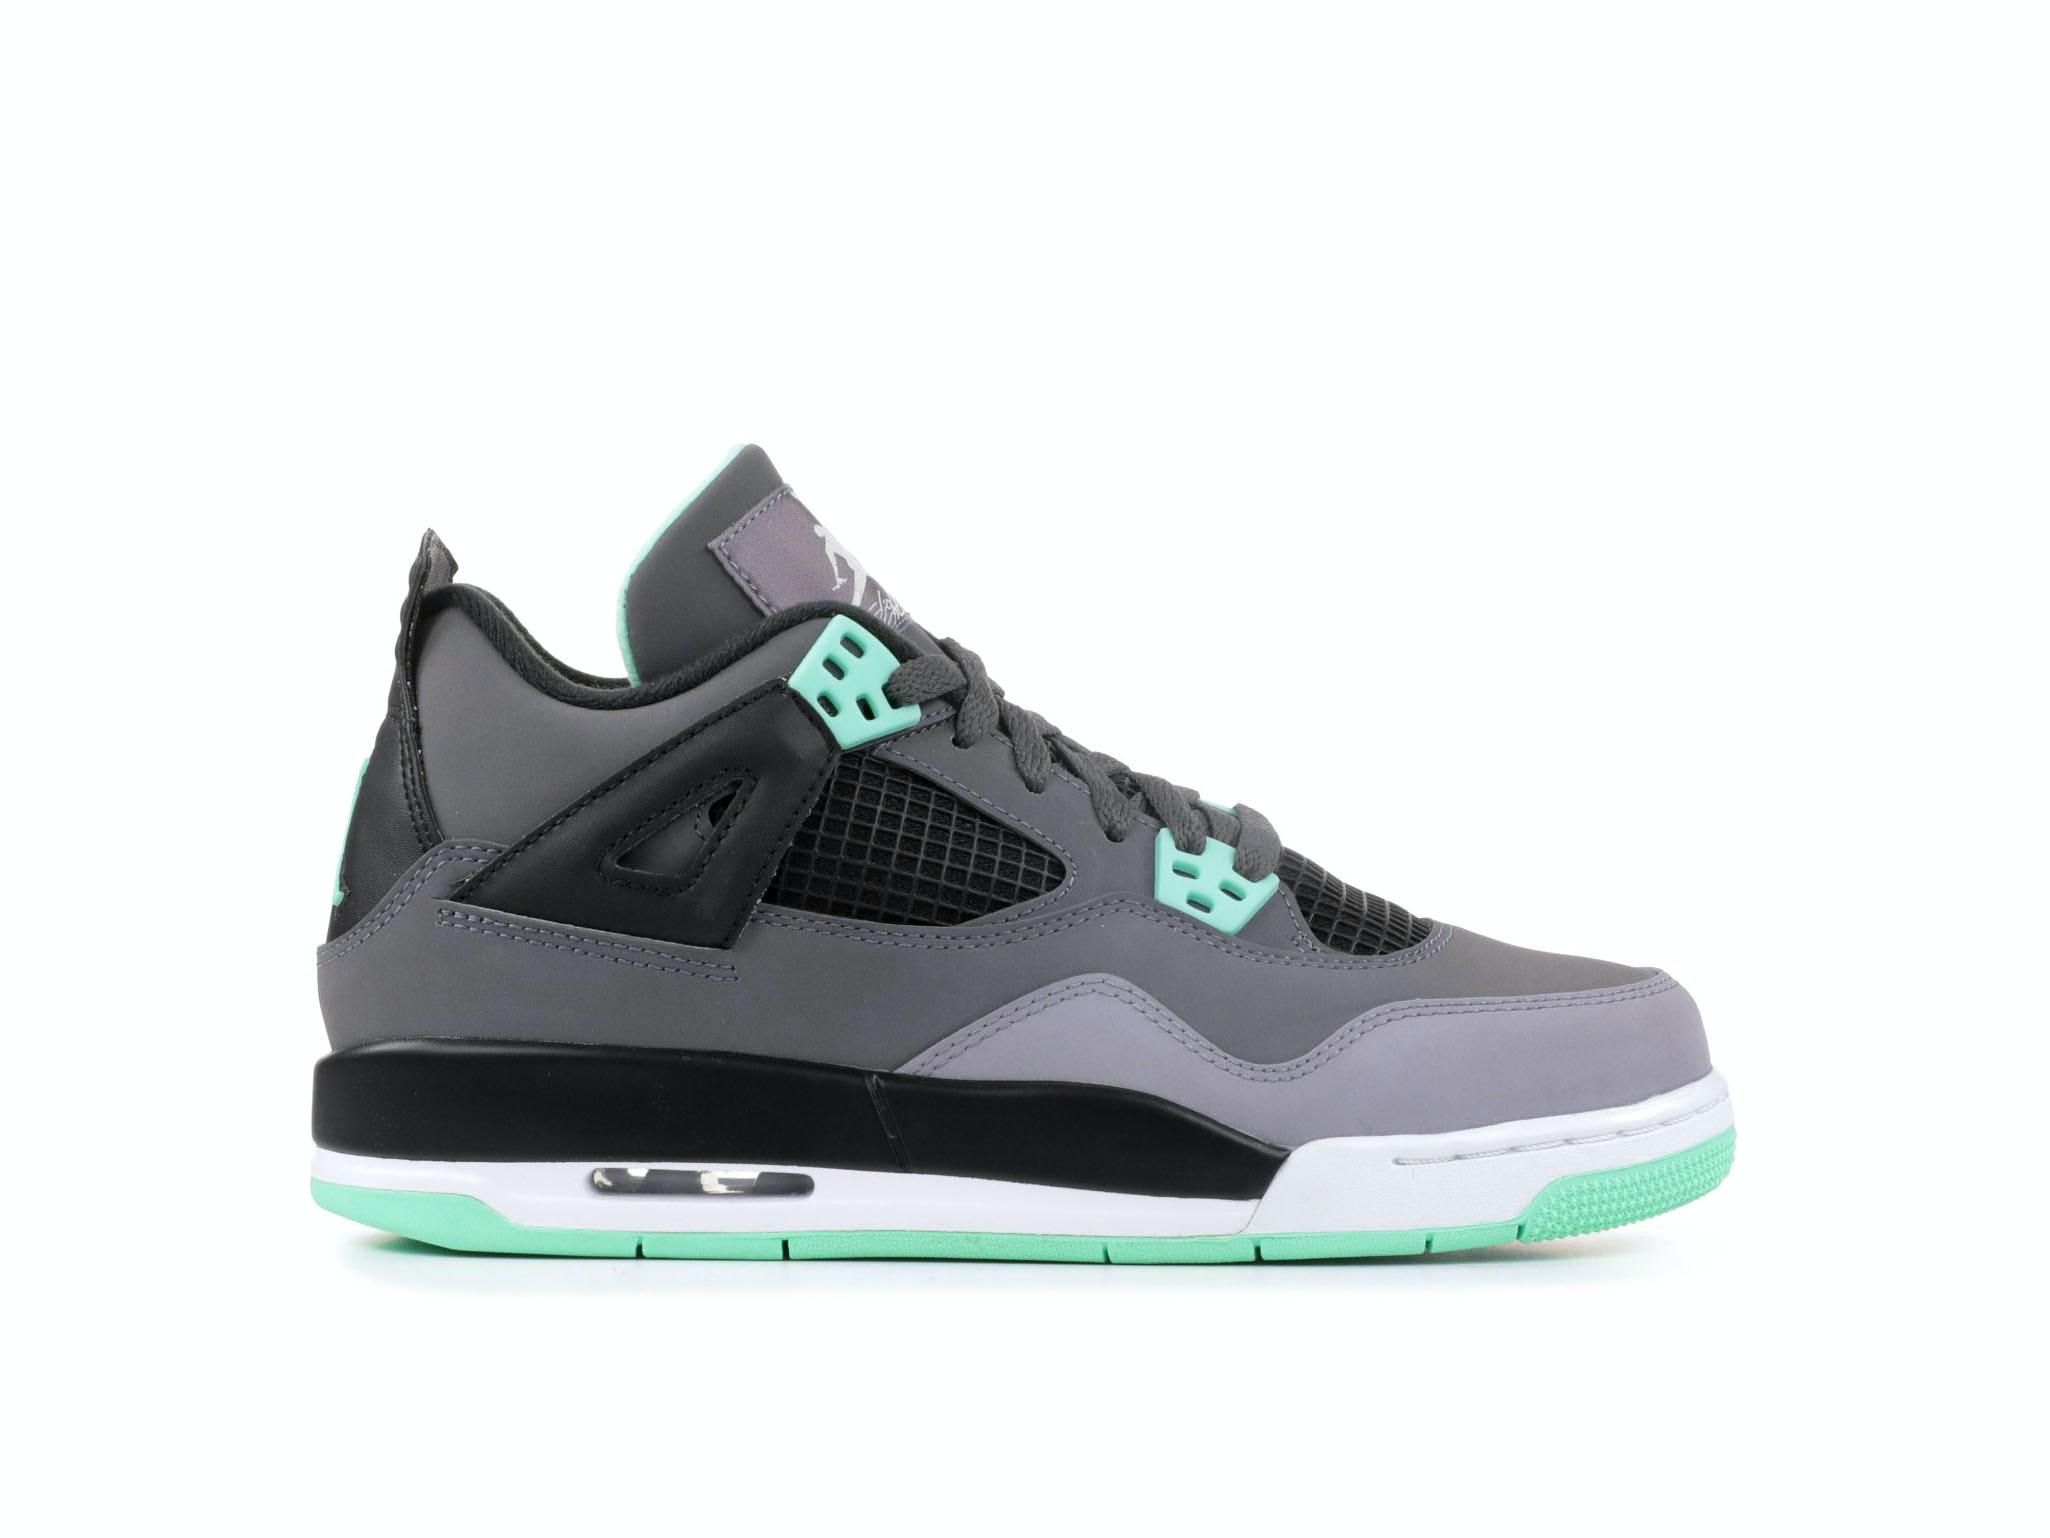 sports shoes 5139c 3a2ee Air Jordan 4 Retro GS Green Glow